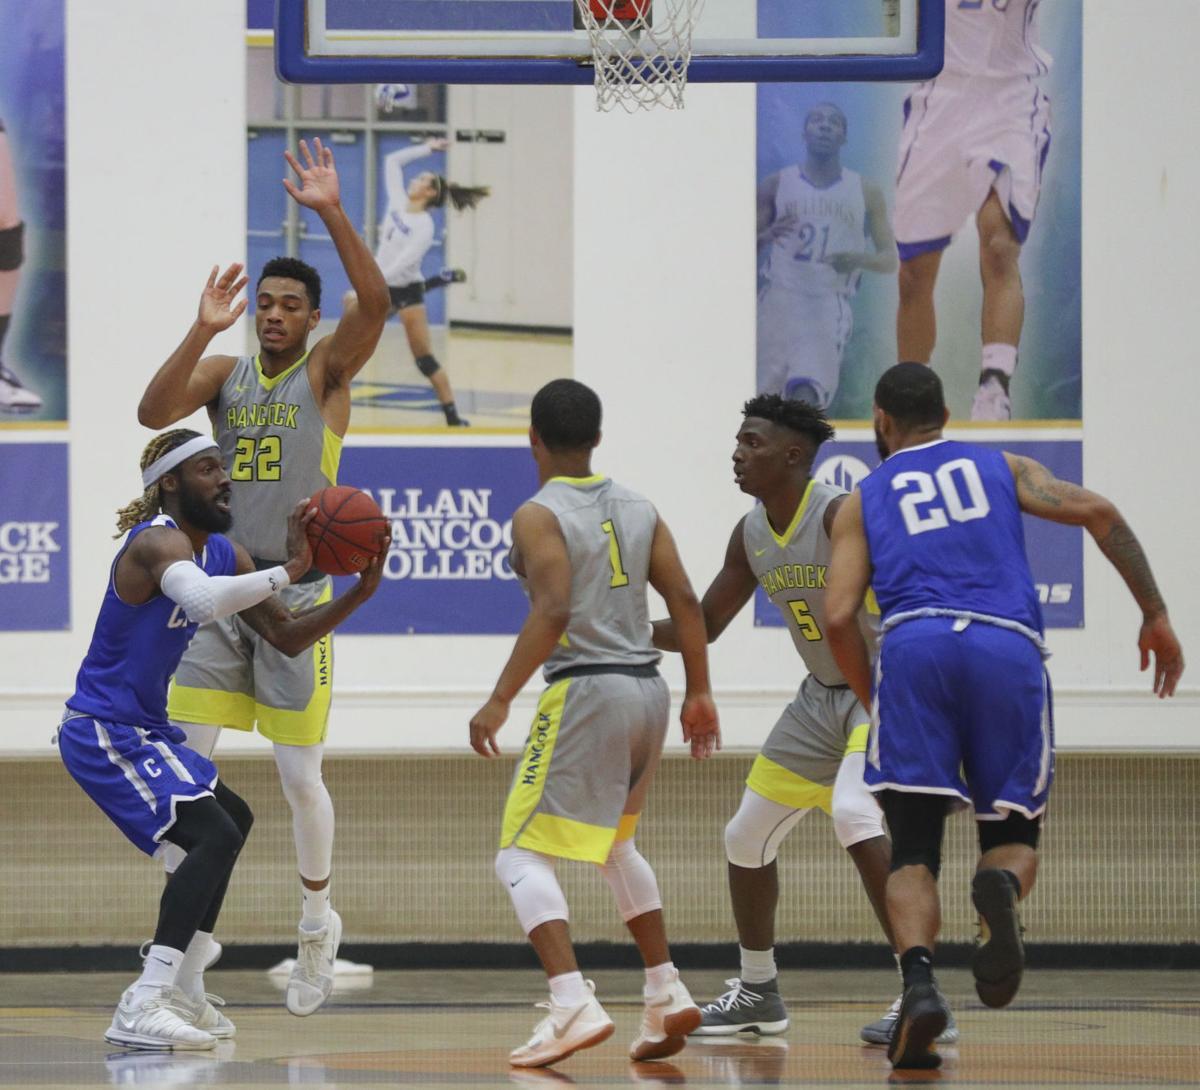 Men's Basketball Hancock vs Cerritos College